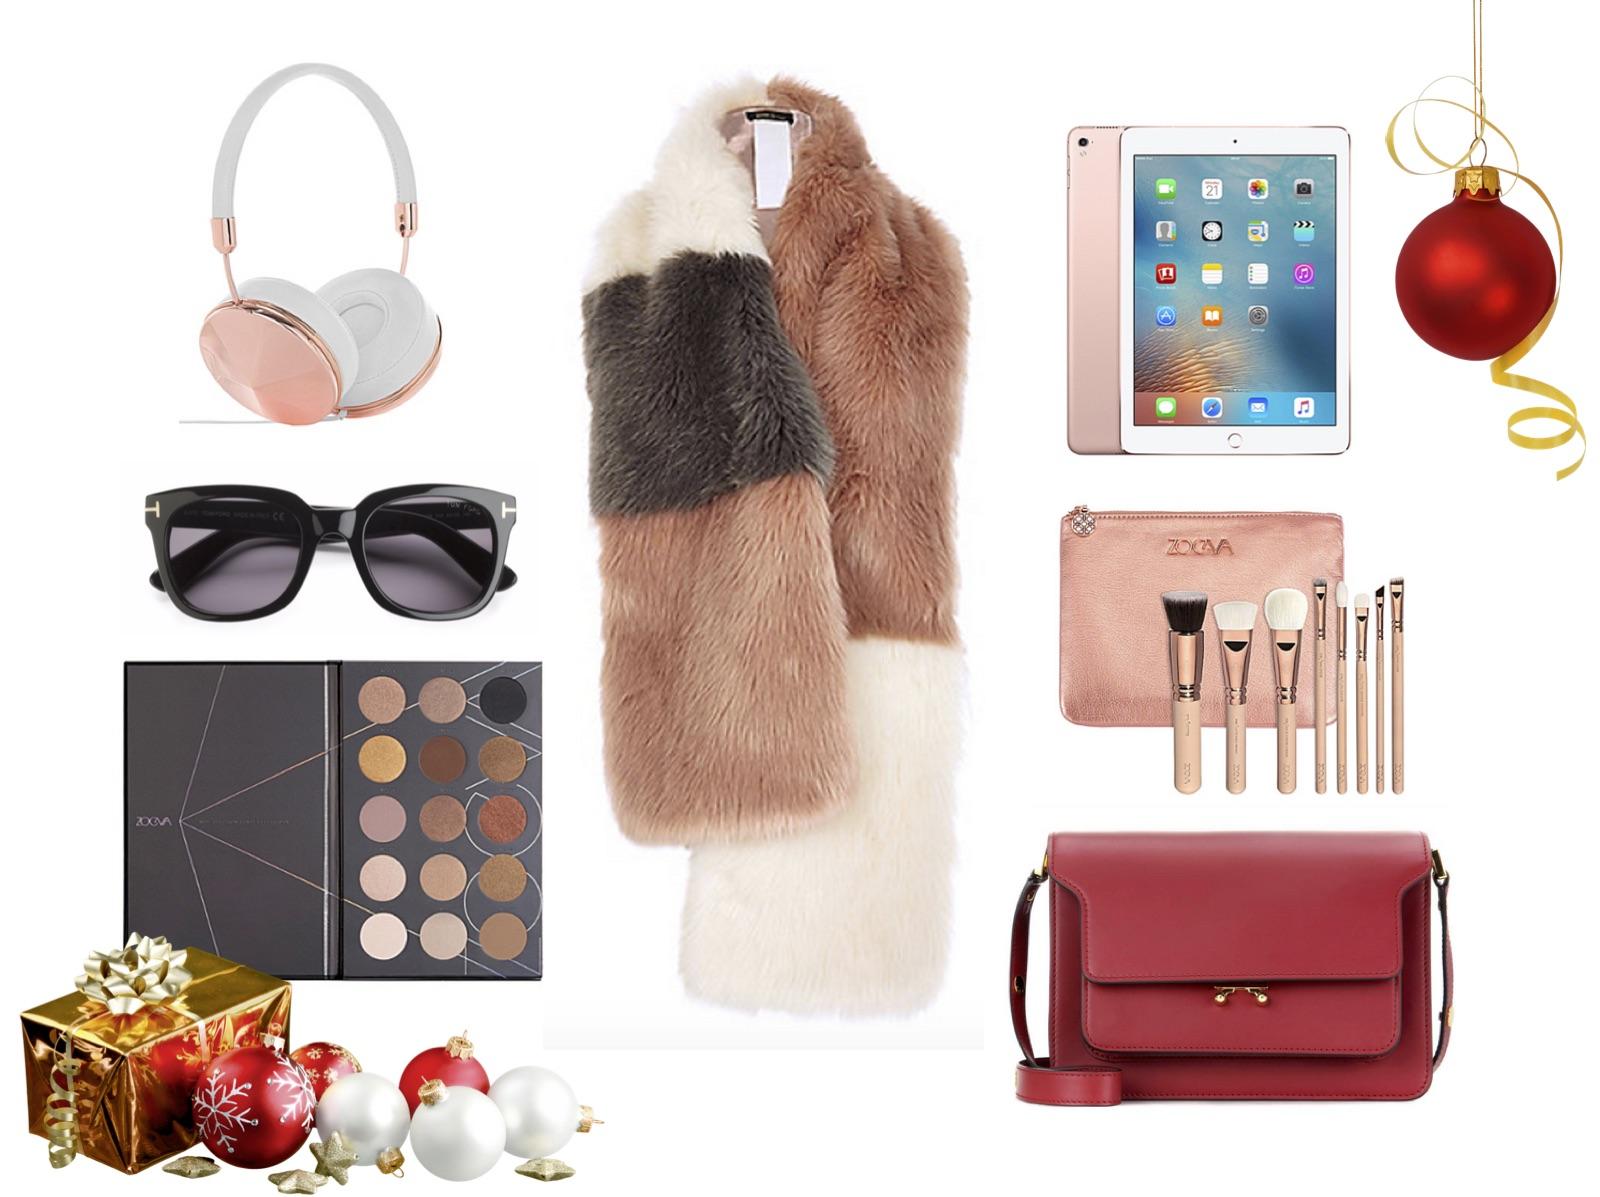 The Ultimate Christmas Gift Guide 2016 | NYC Blogger | Christmas 2016